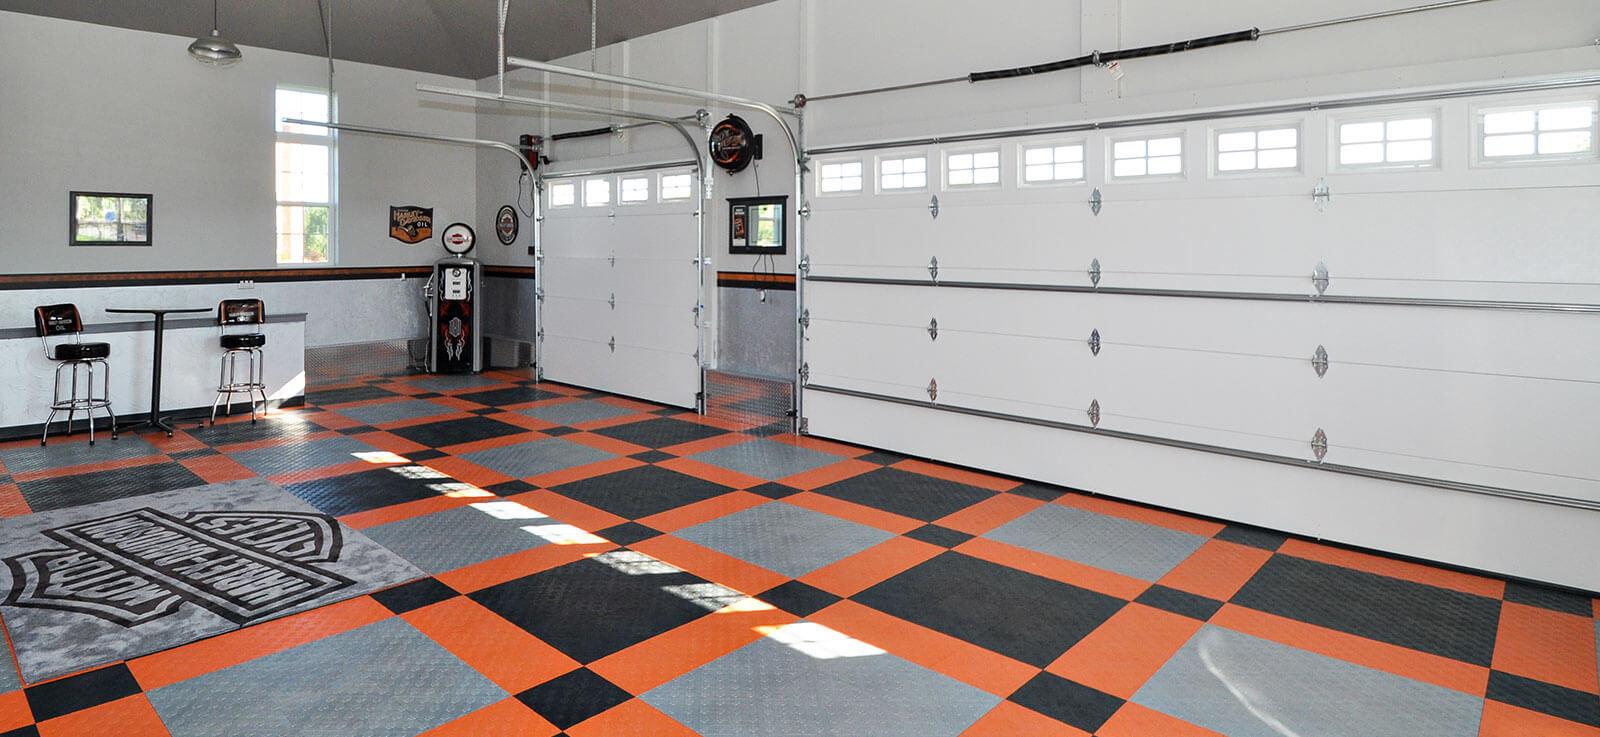 Harley Davidson Garage Flooring in dimensions 1600 X 737